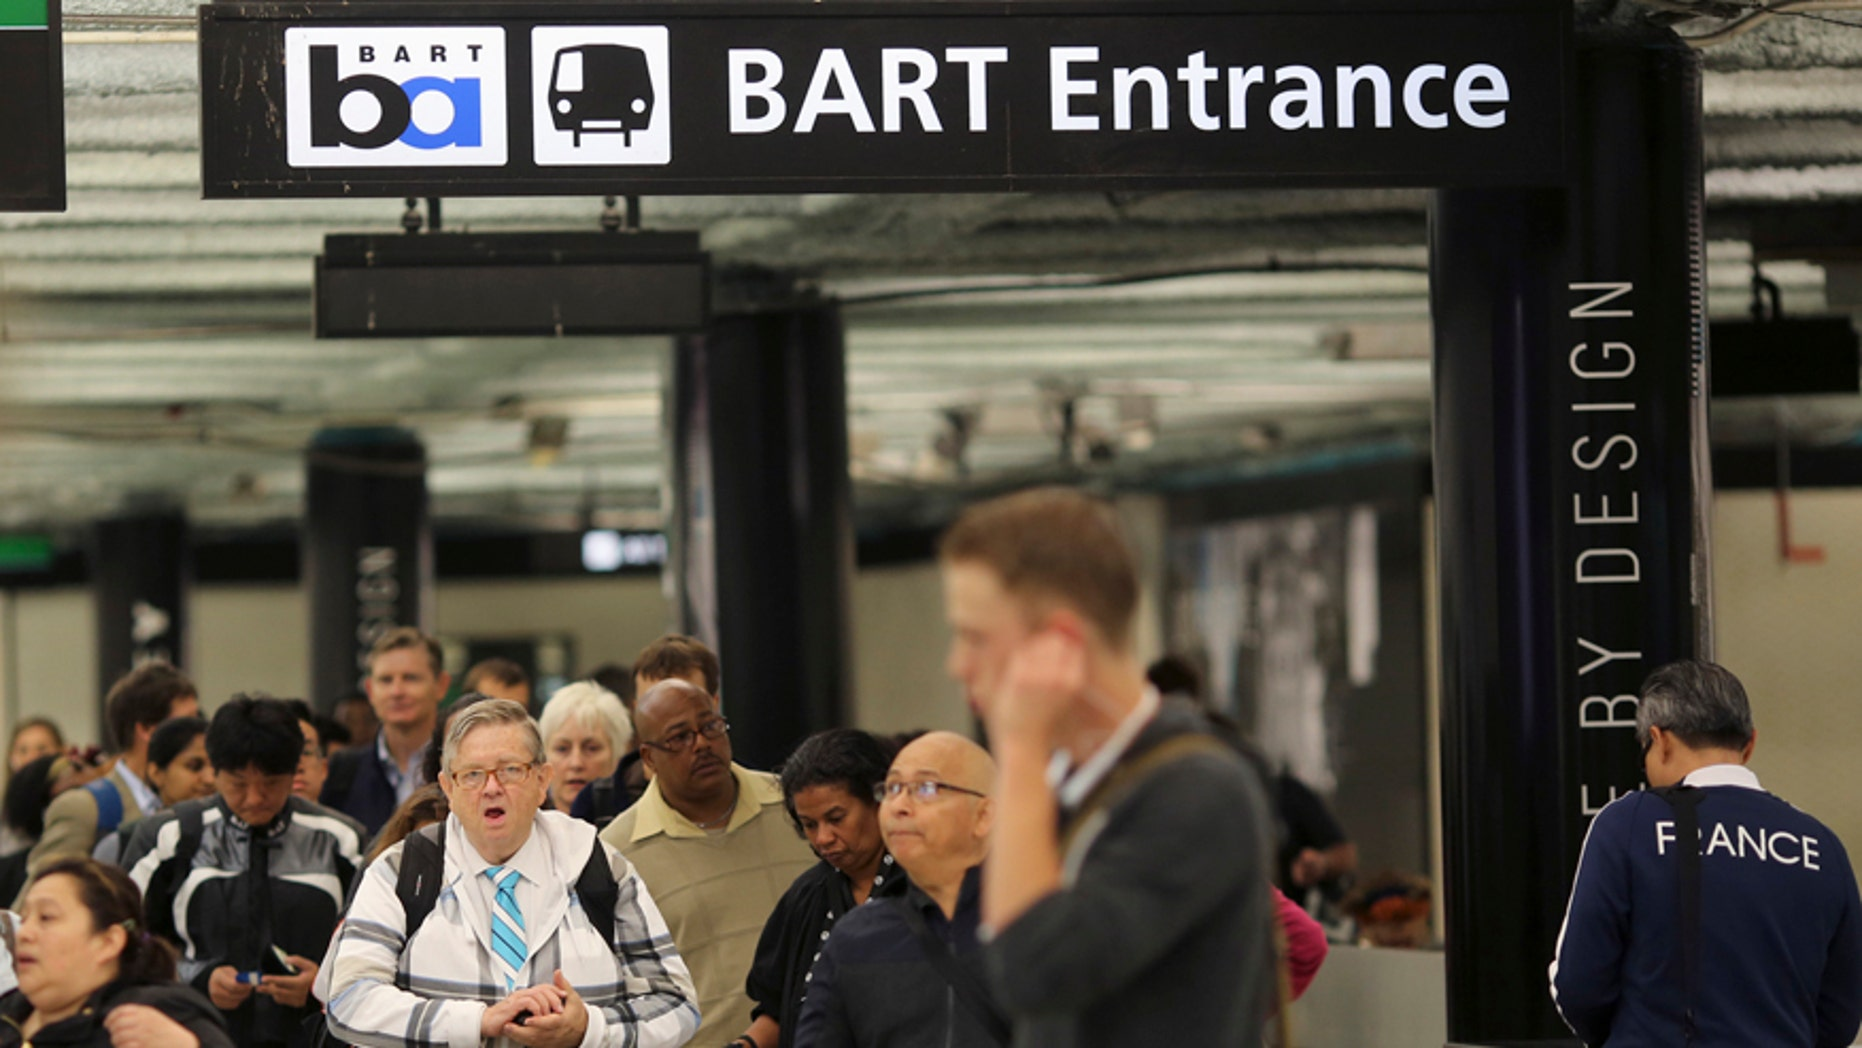 Bay Area Rapid Transit (BART) rail station.